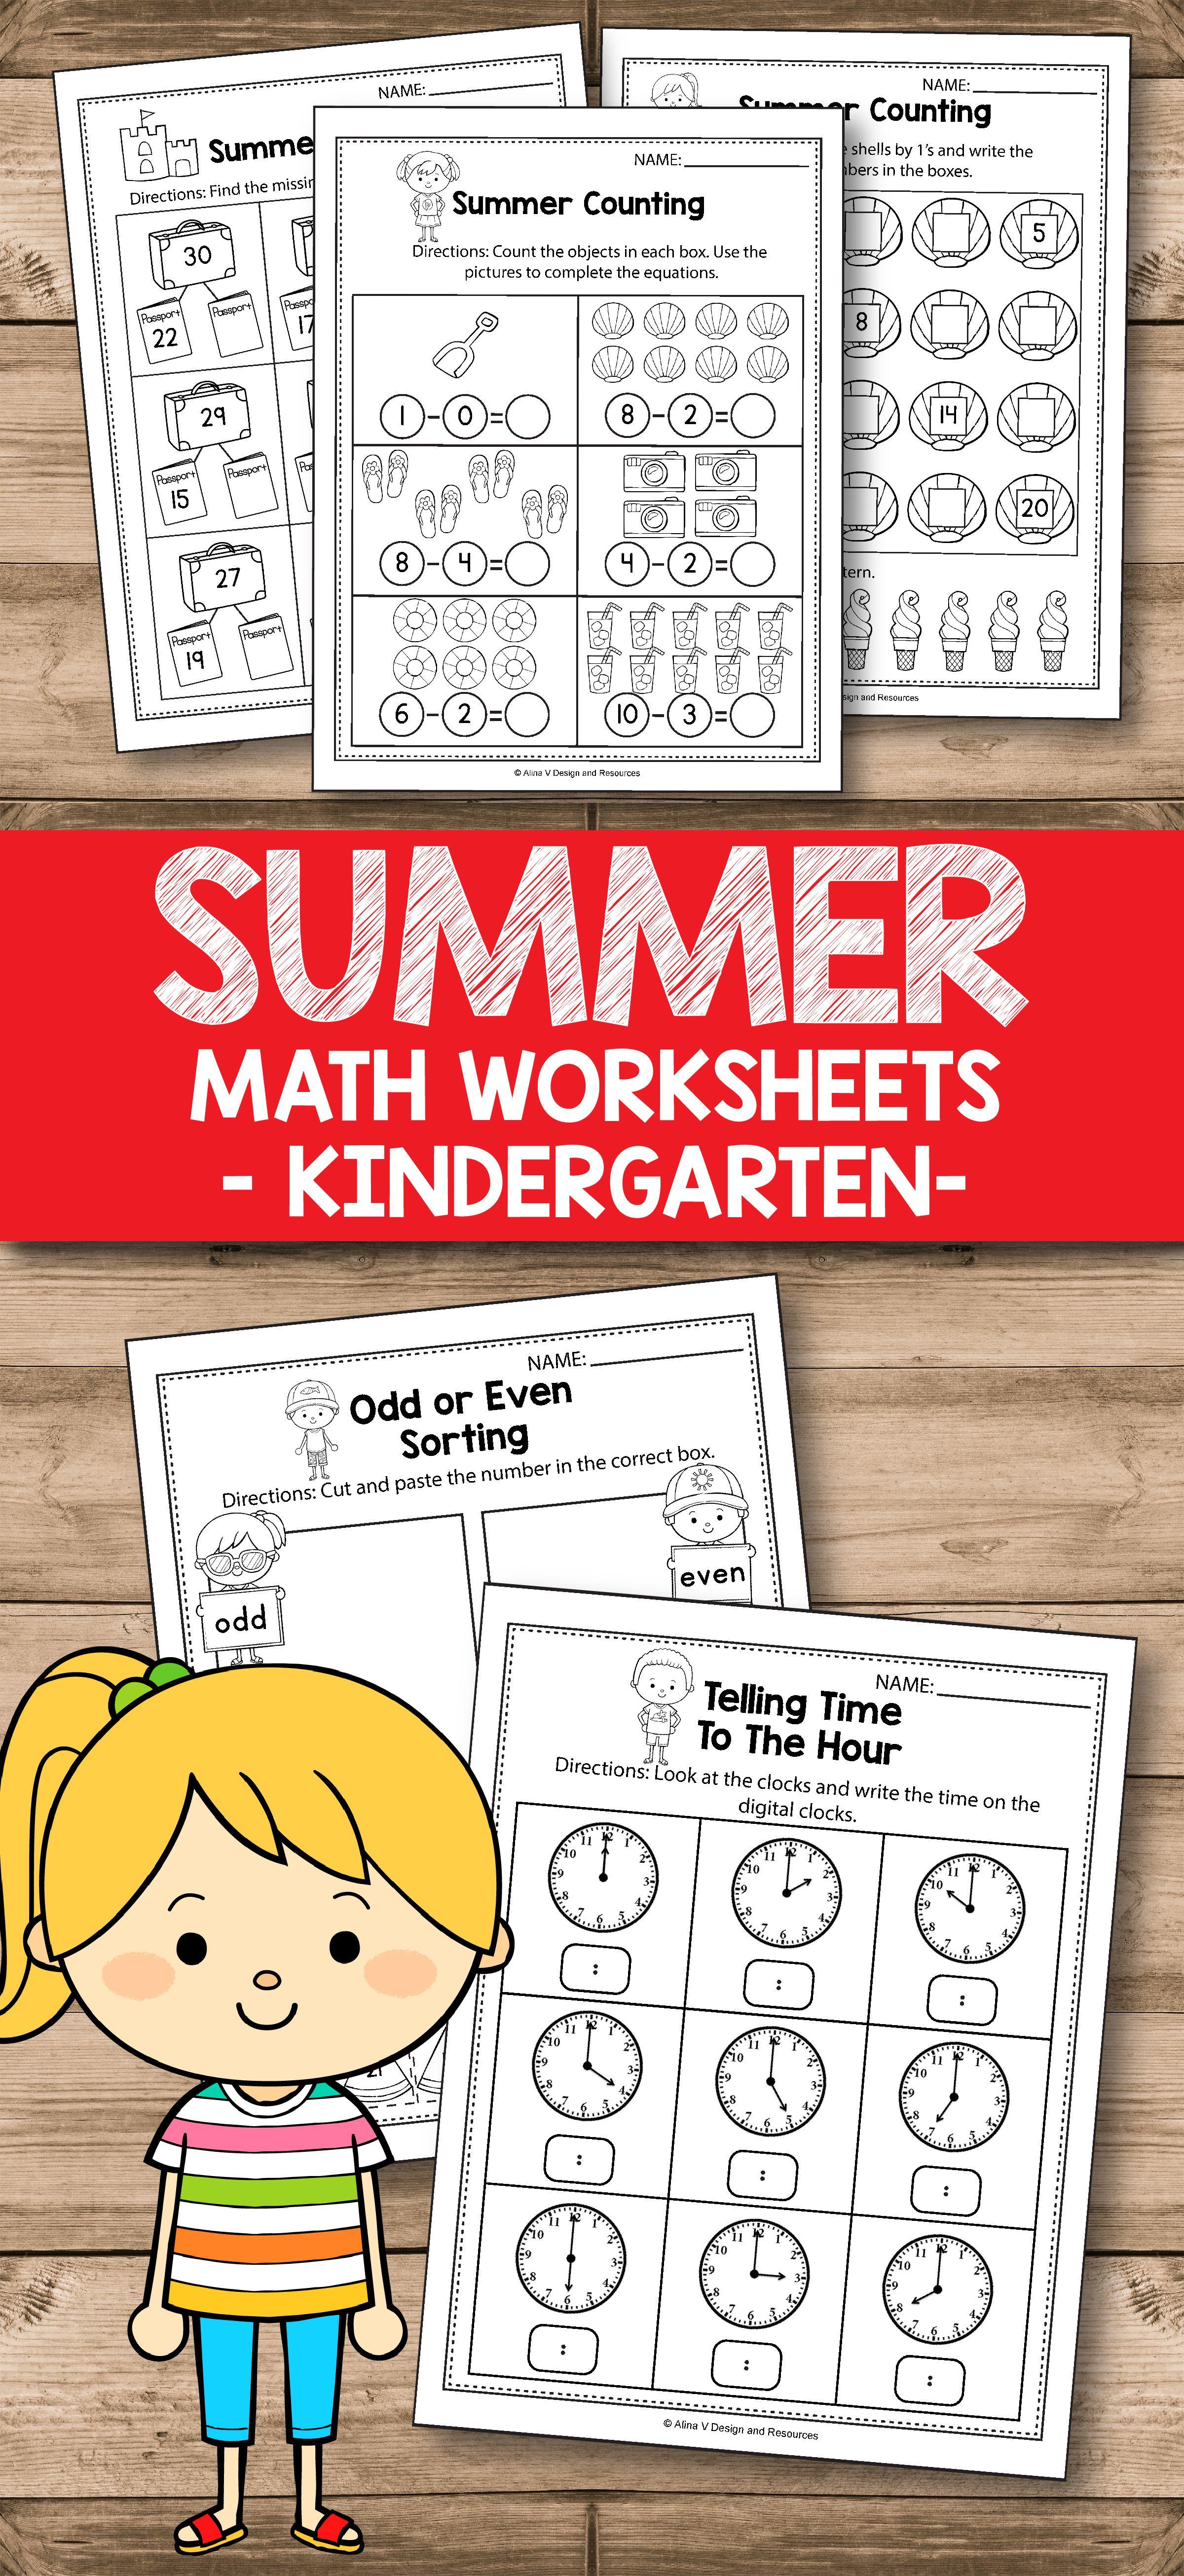 Summer Review Math Worksheets For Preschool Kindergarten